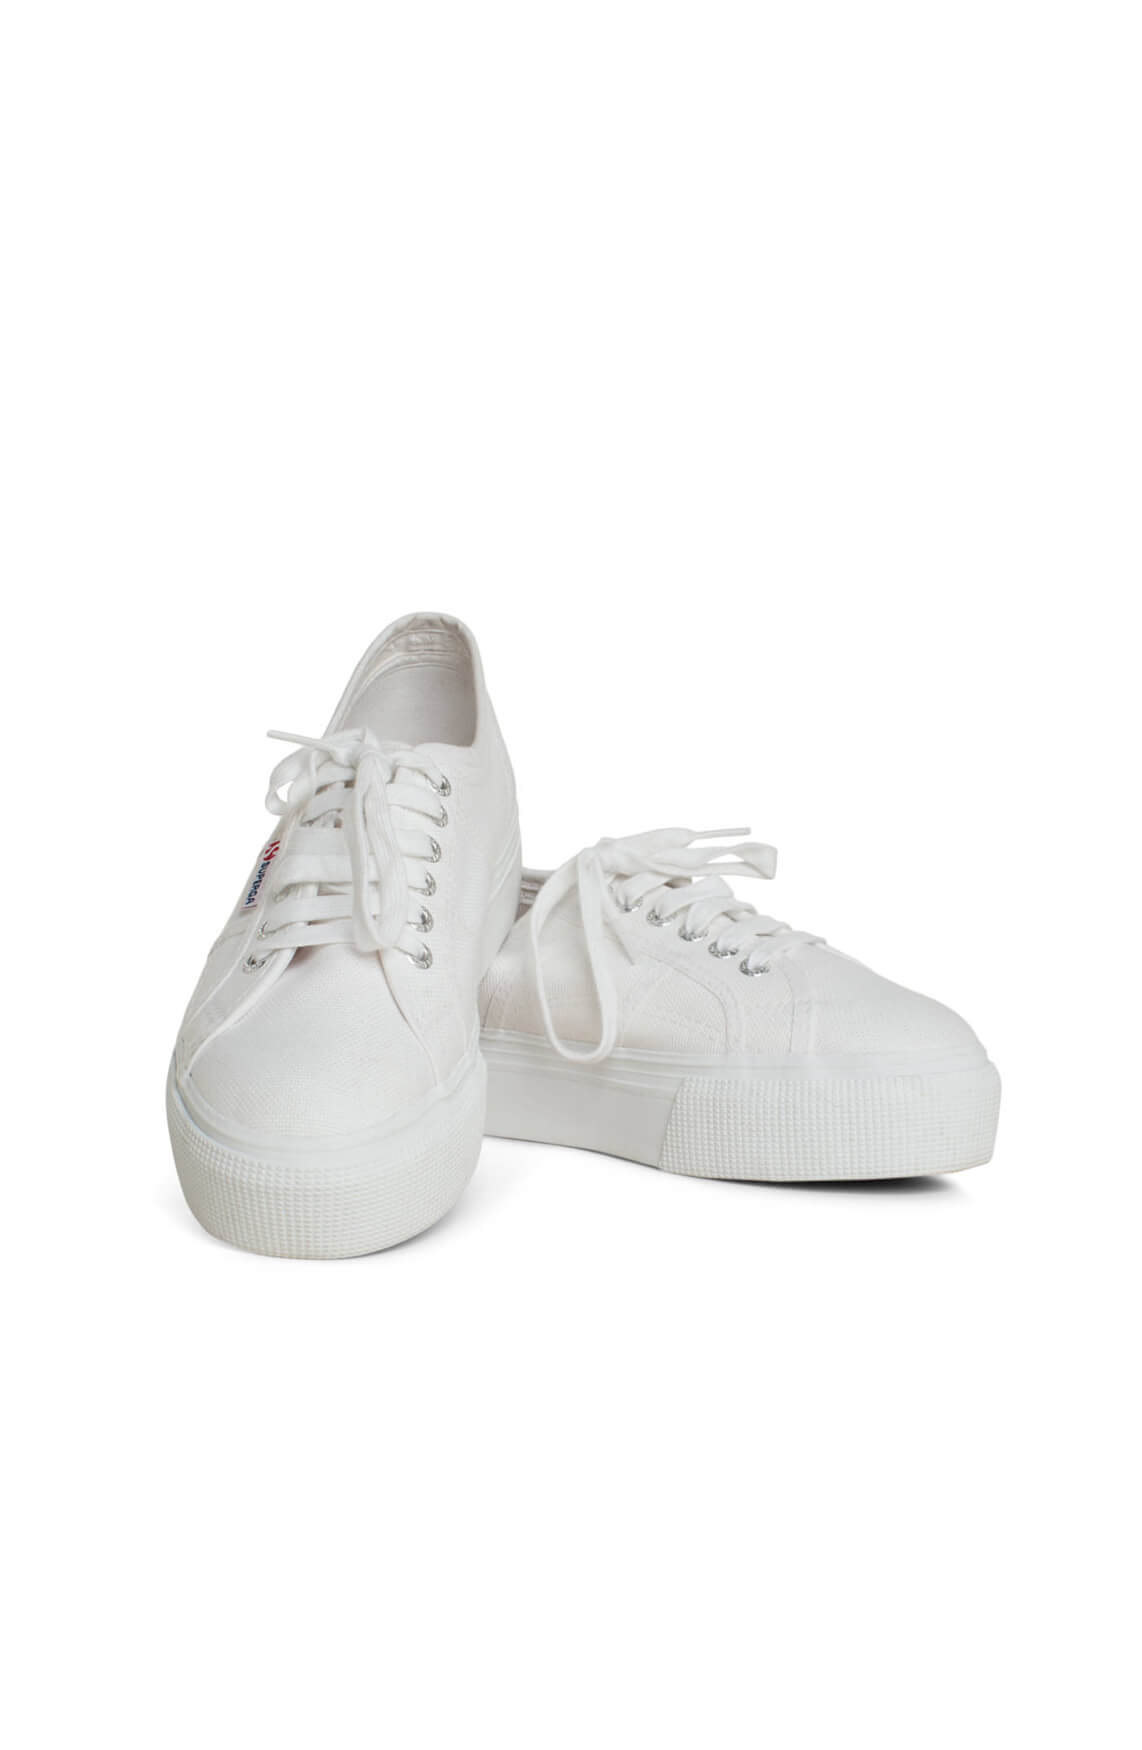 Superga Dames Sneaker met plateauzool wit